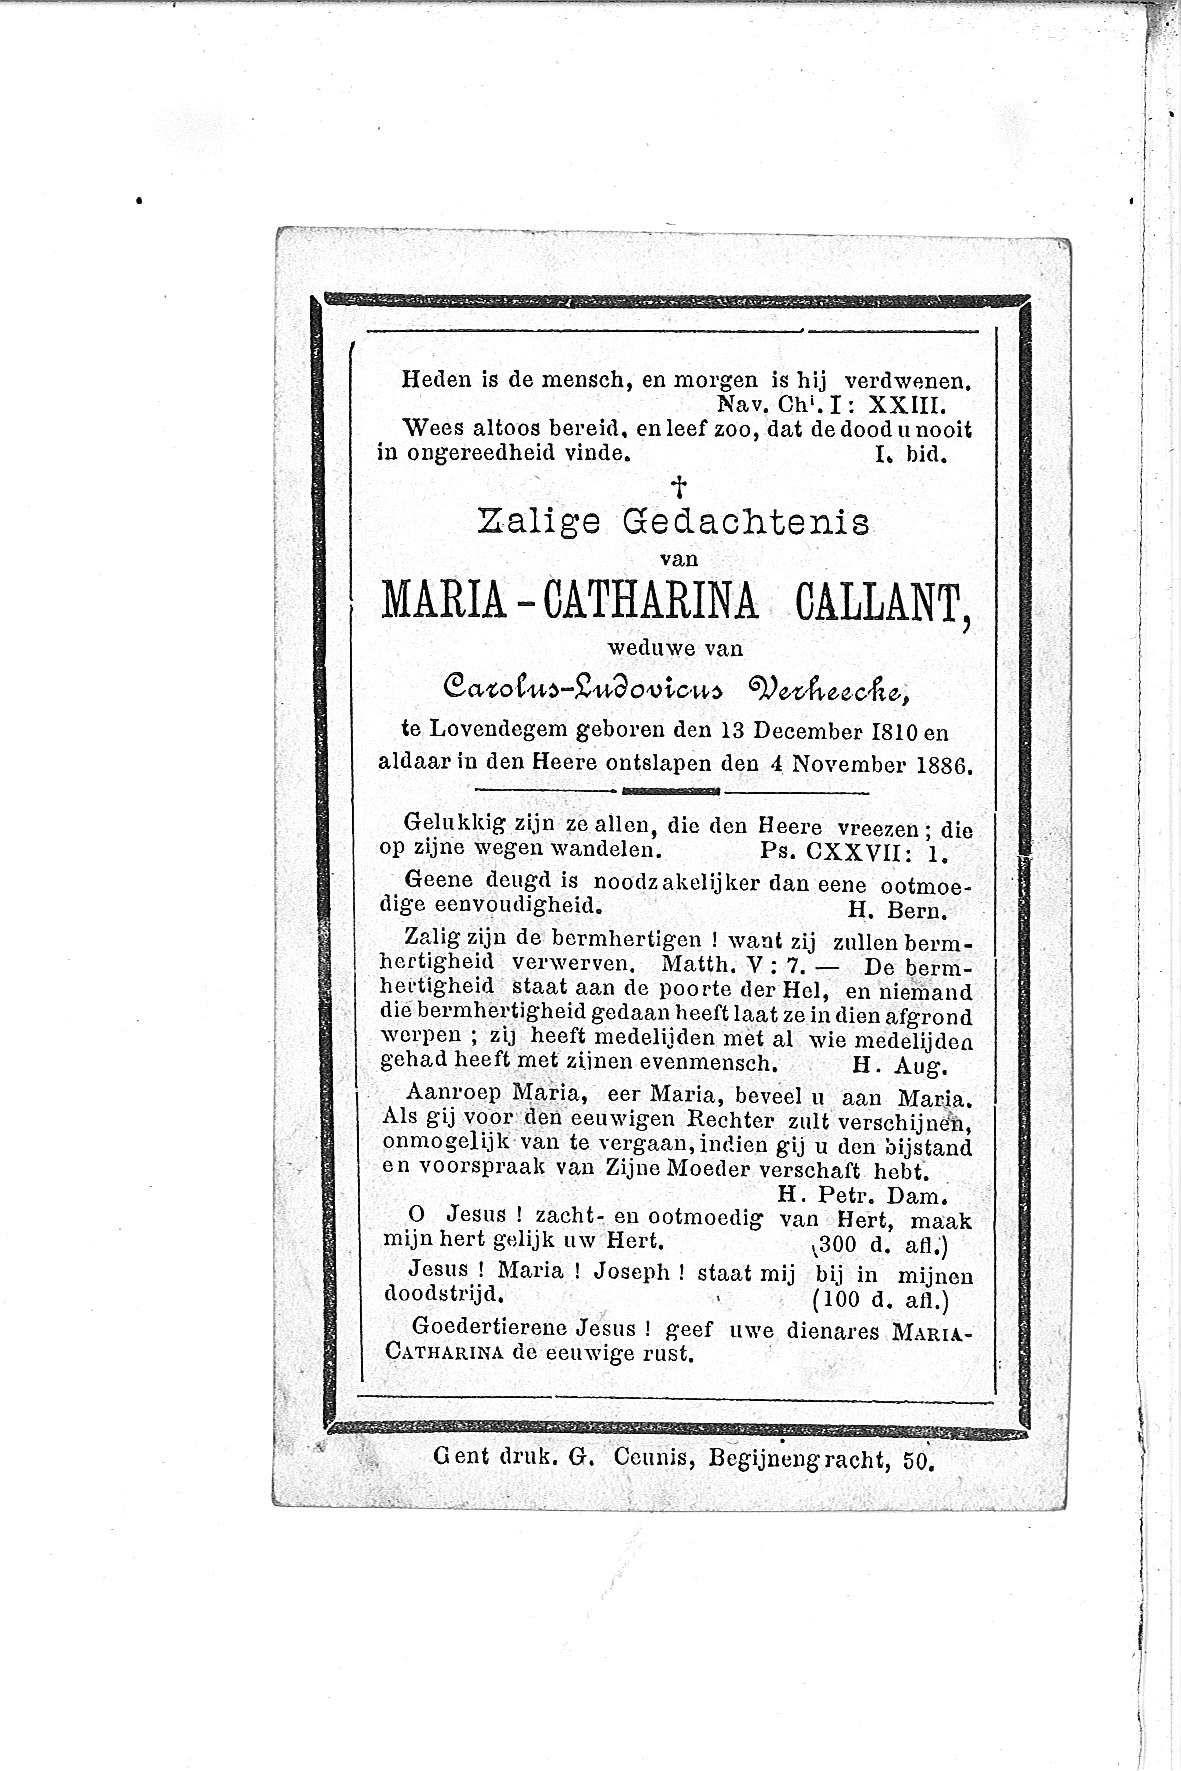 maria-catharina(1886)20101104083918_00058.jpg